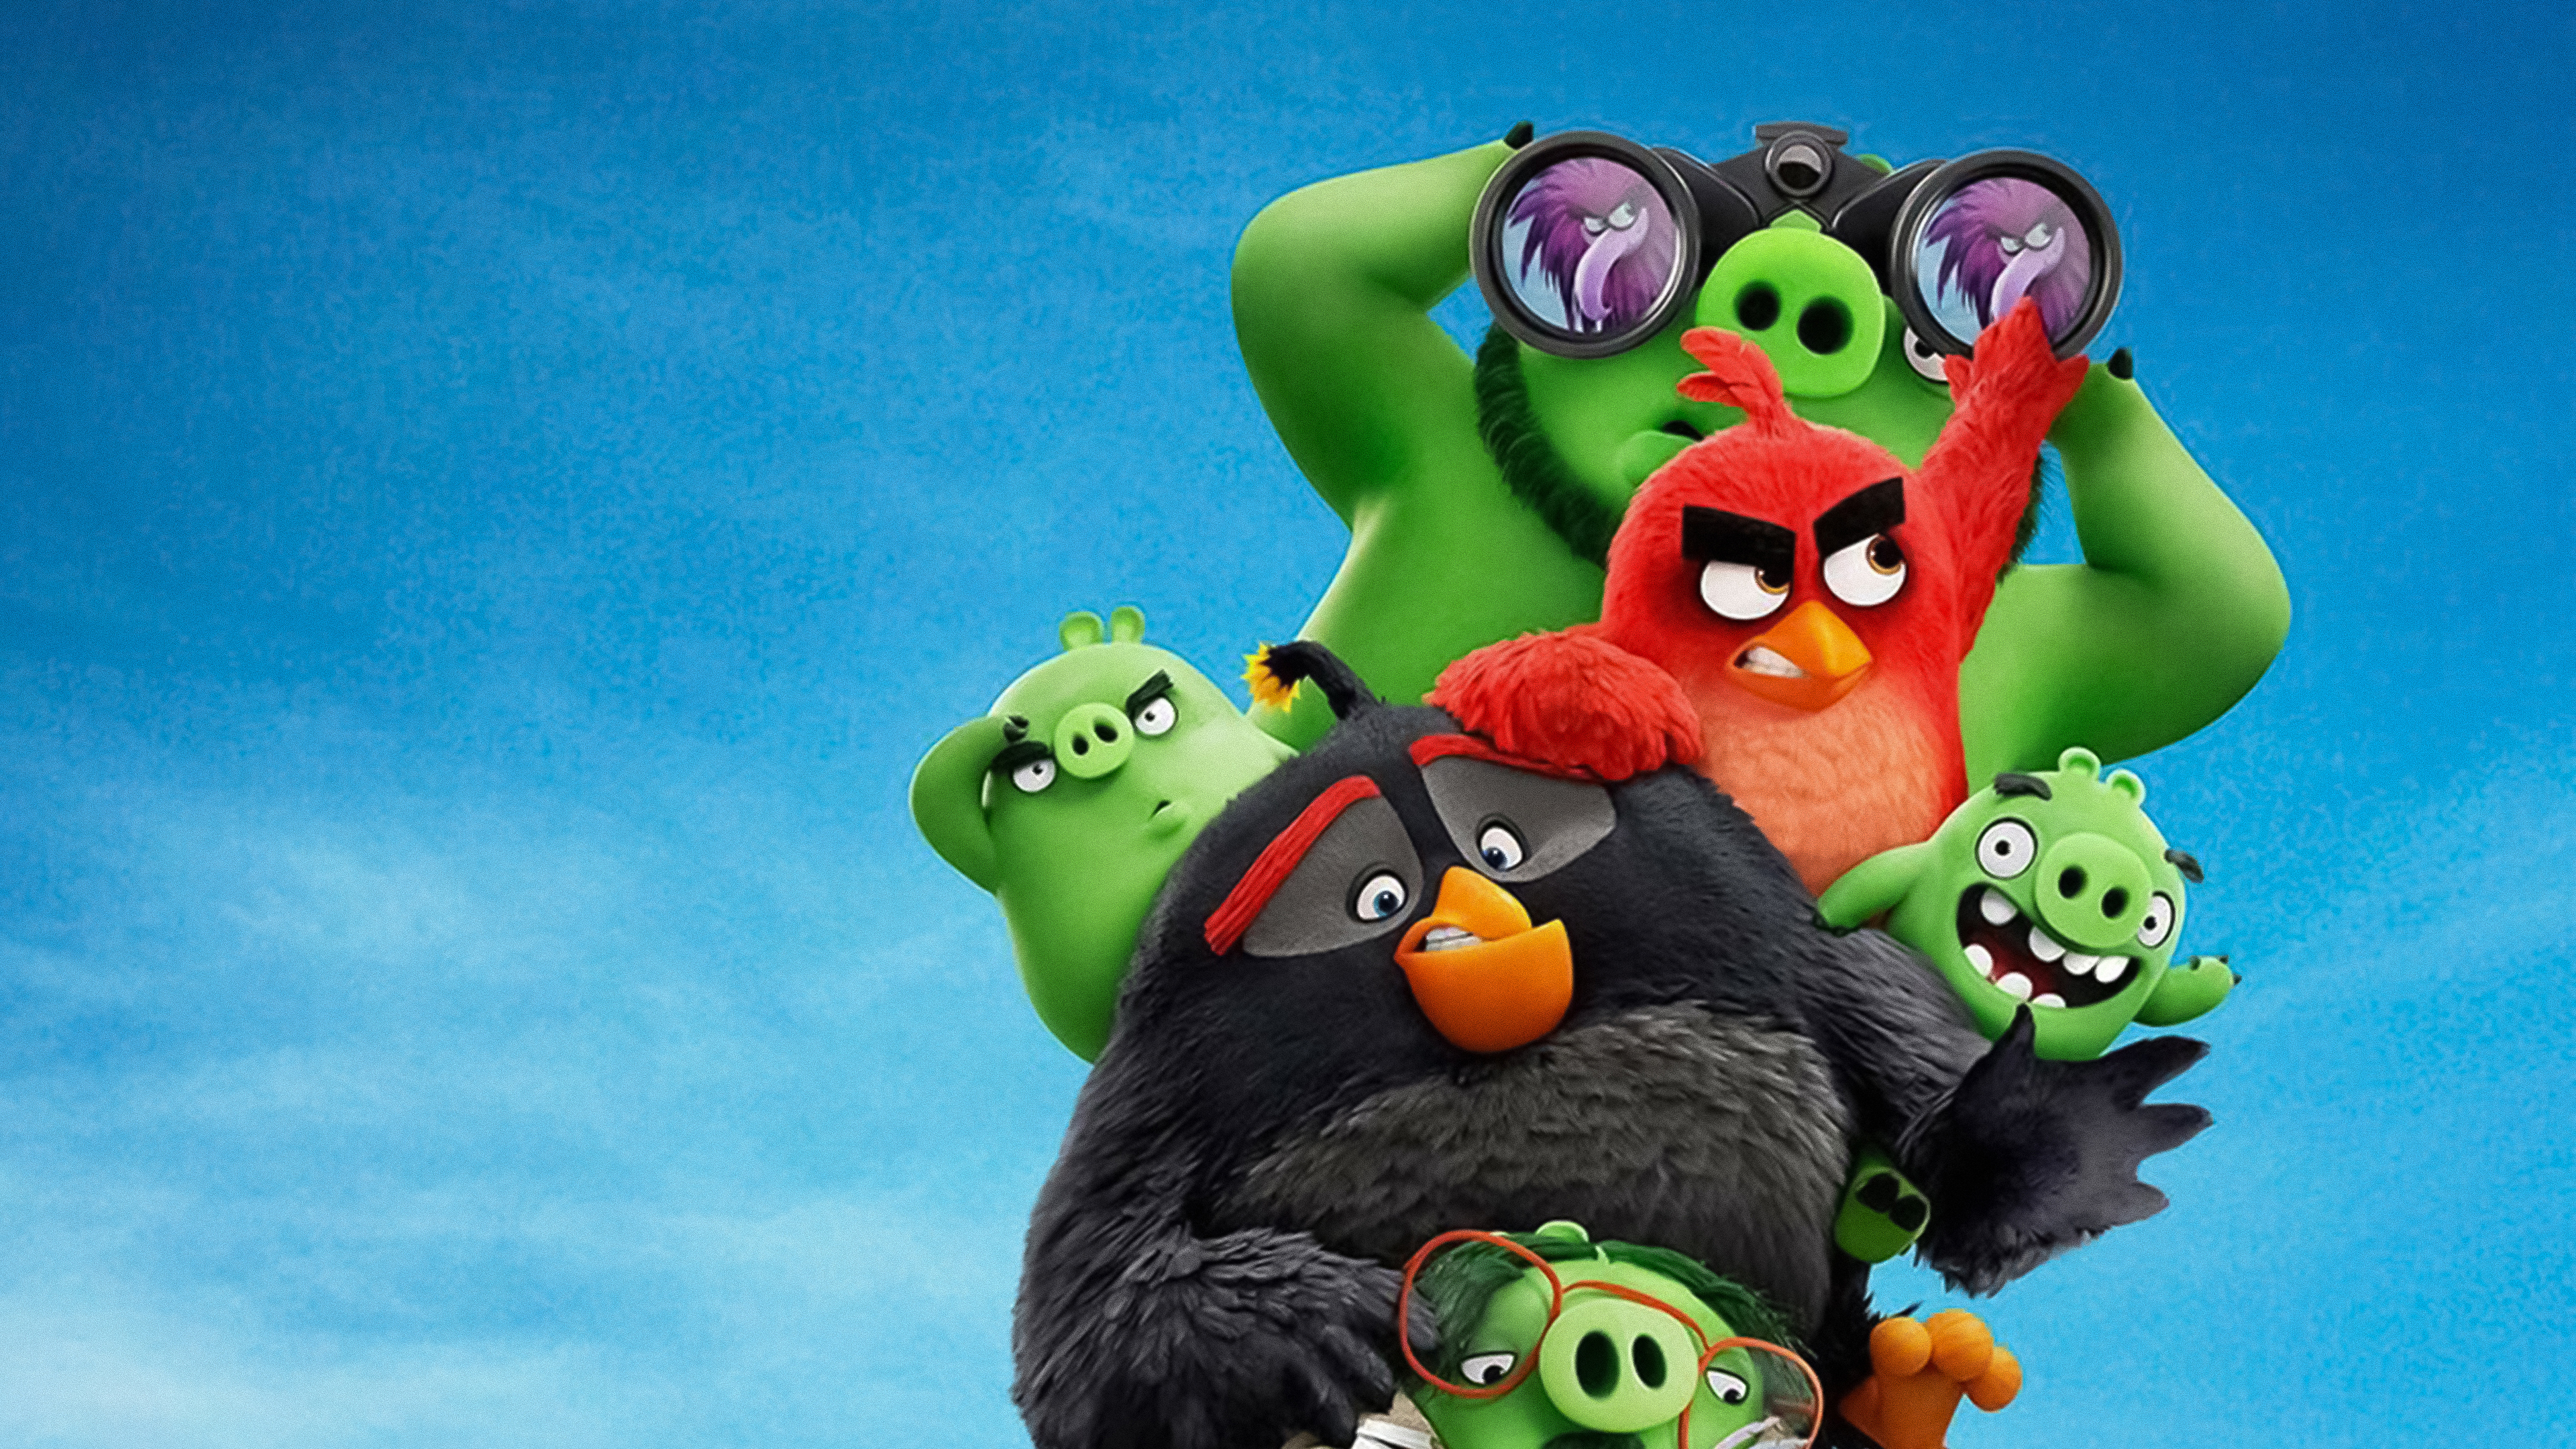 the angry birds movie 2 4k 1560535107 - The Angry Birds Movie 2 4k - the angry birds movie 2 wallpapers, the angry birds 2 wallpapers, movies wallpapers, hd-wallpapers, angry birds wallpapers, 4k-wallpapers, 2019 movies wallpapers